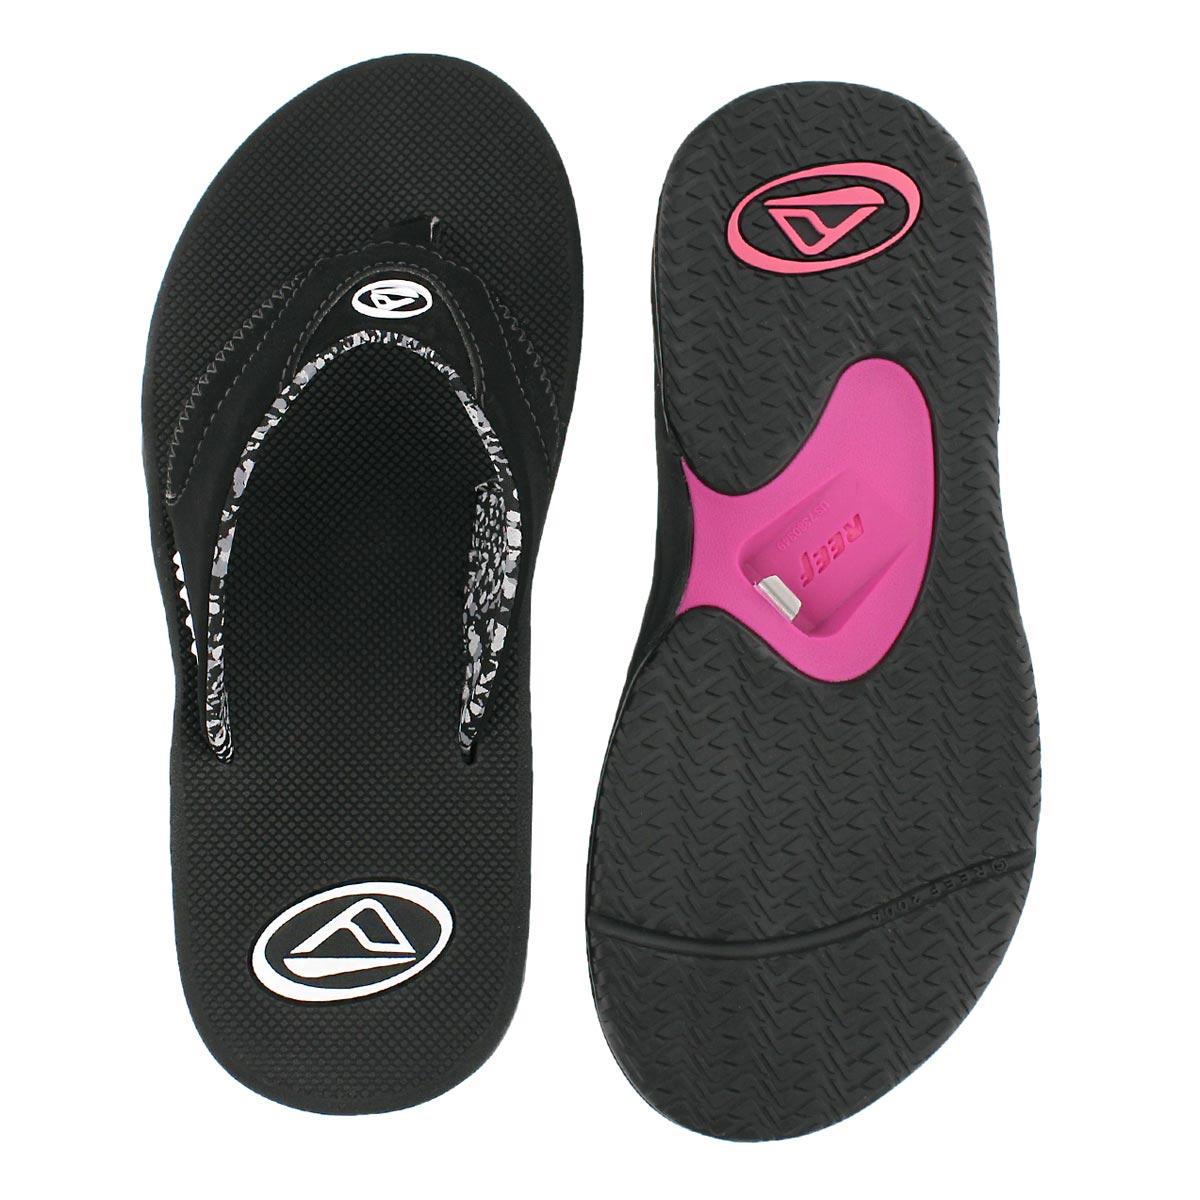 Lds Fanning black thong sandal